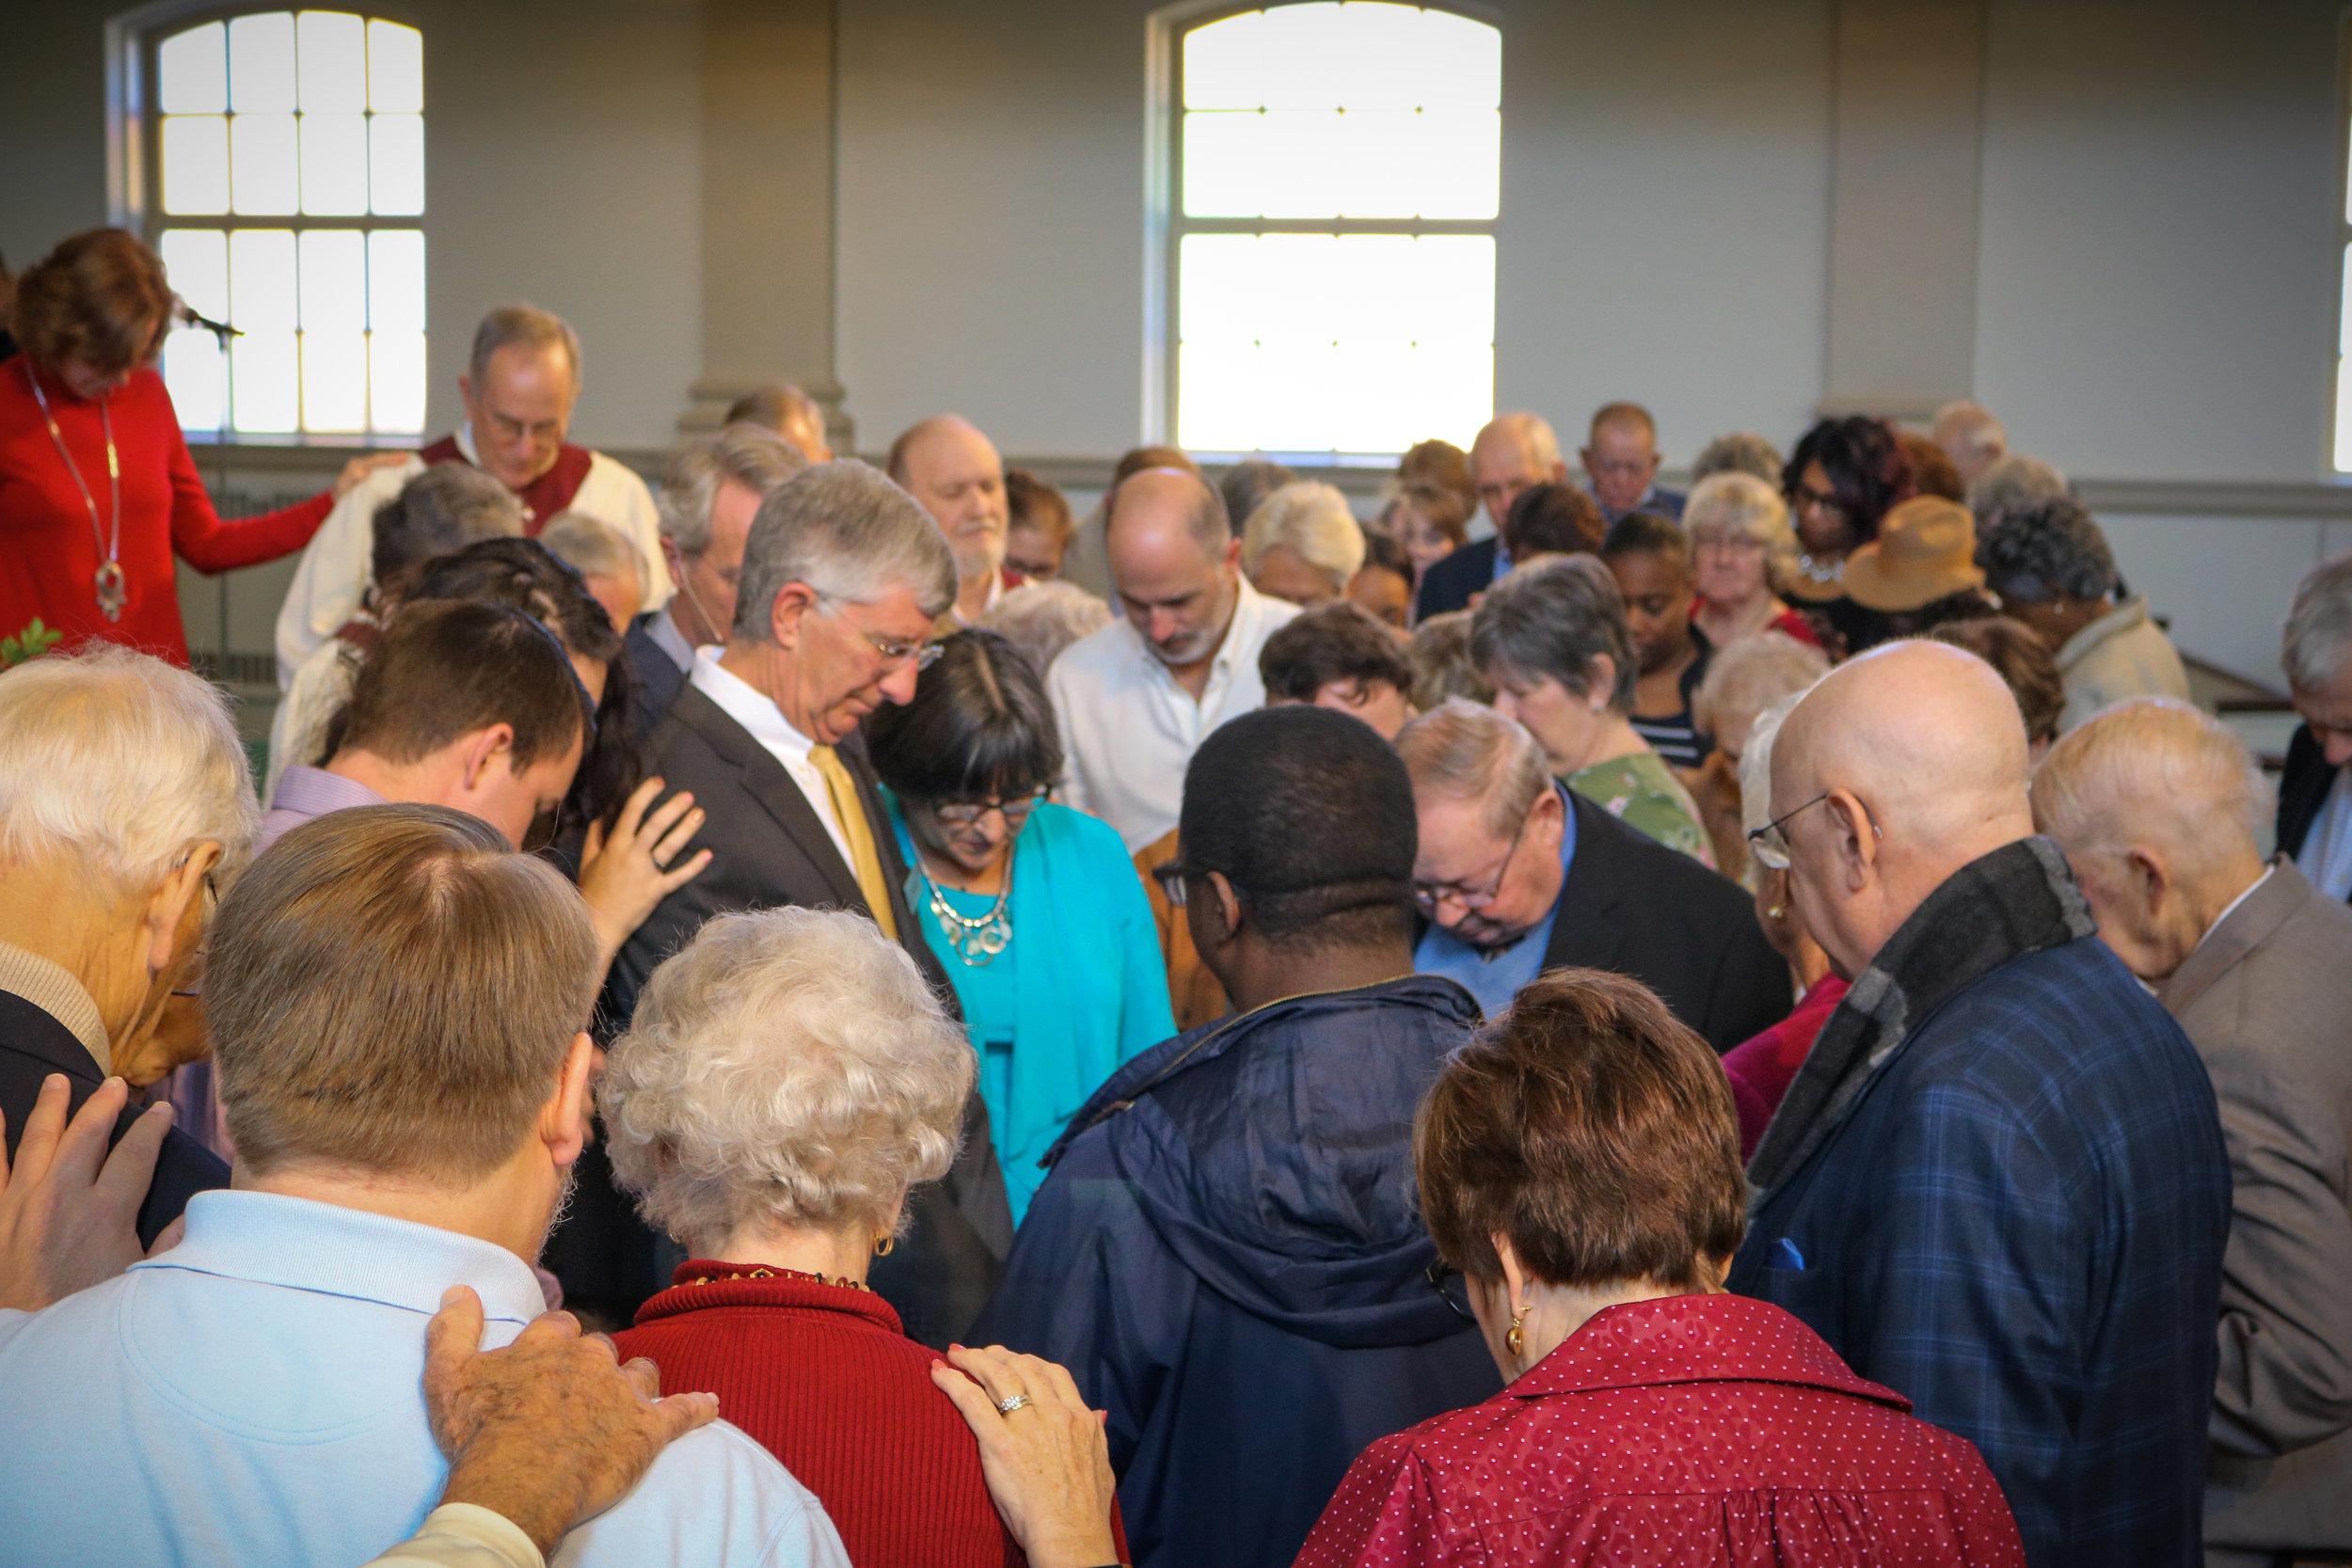 first-baptist-church-decatur-worship-bob-williamson4.jpg